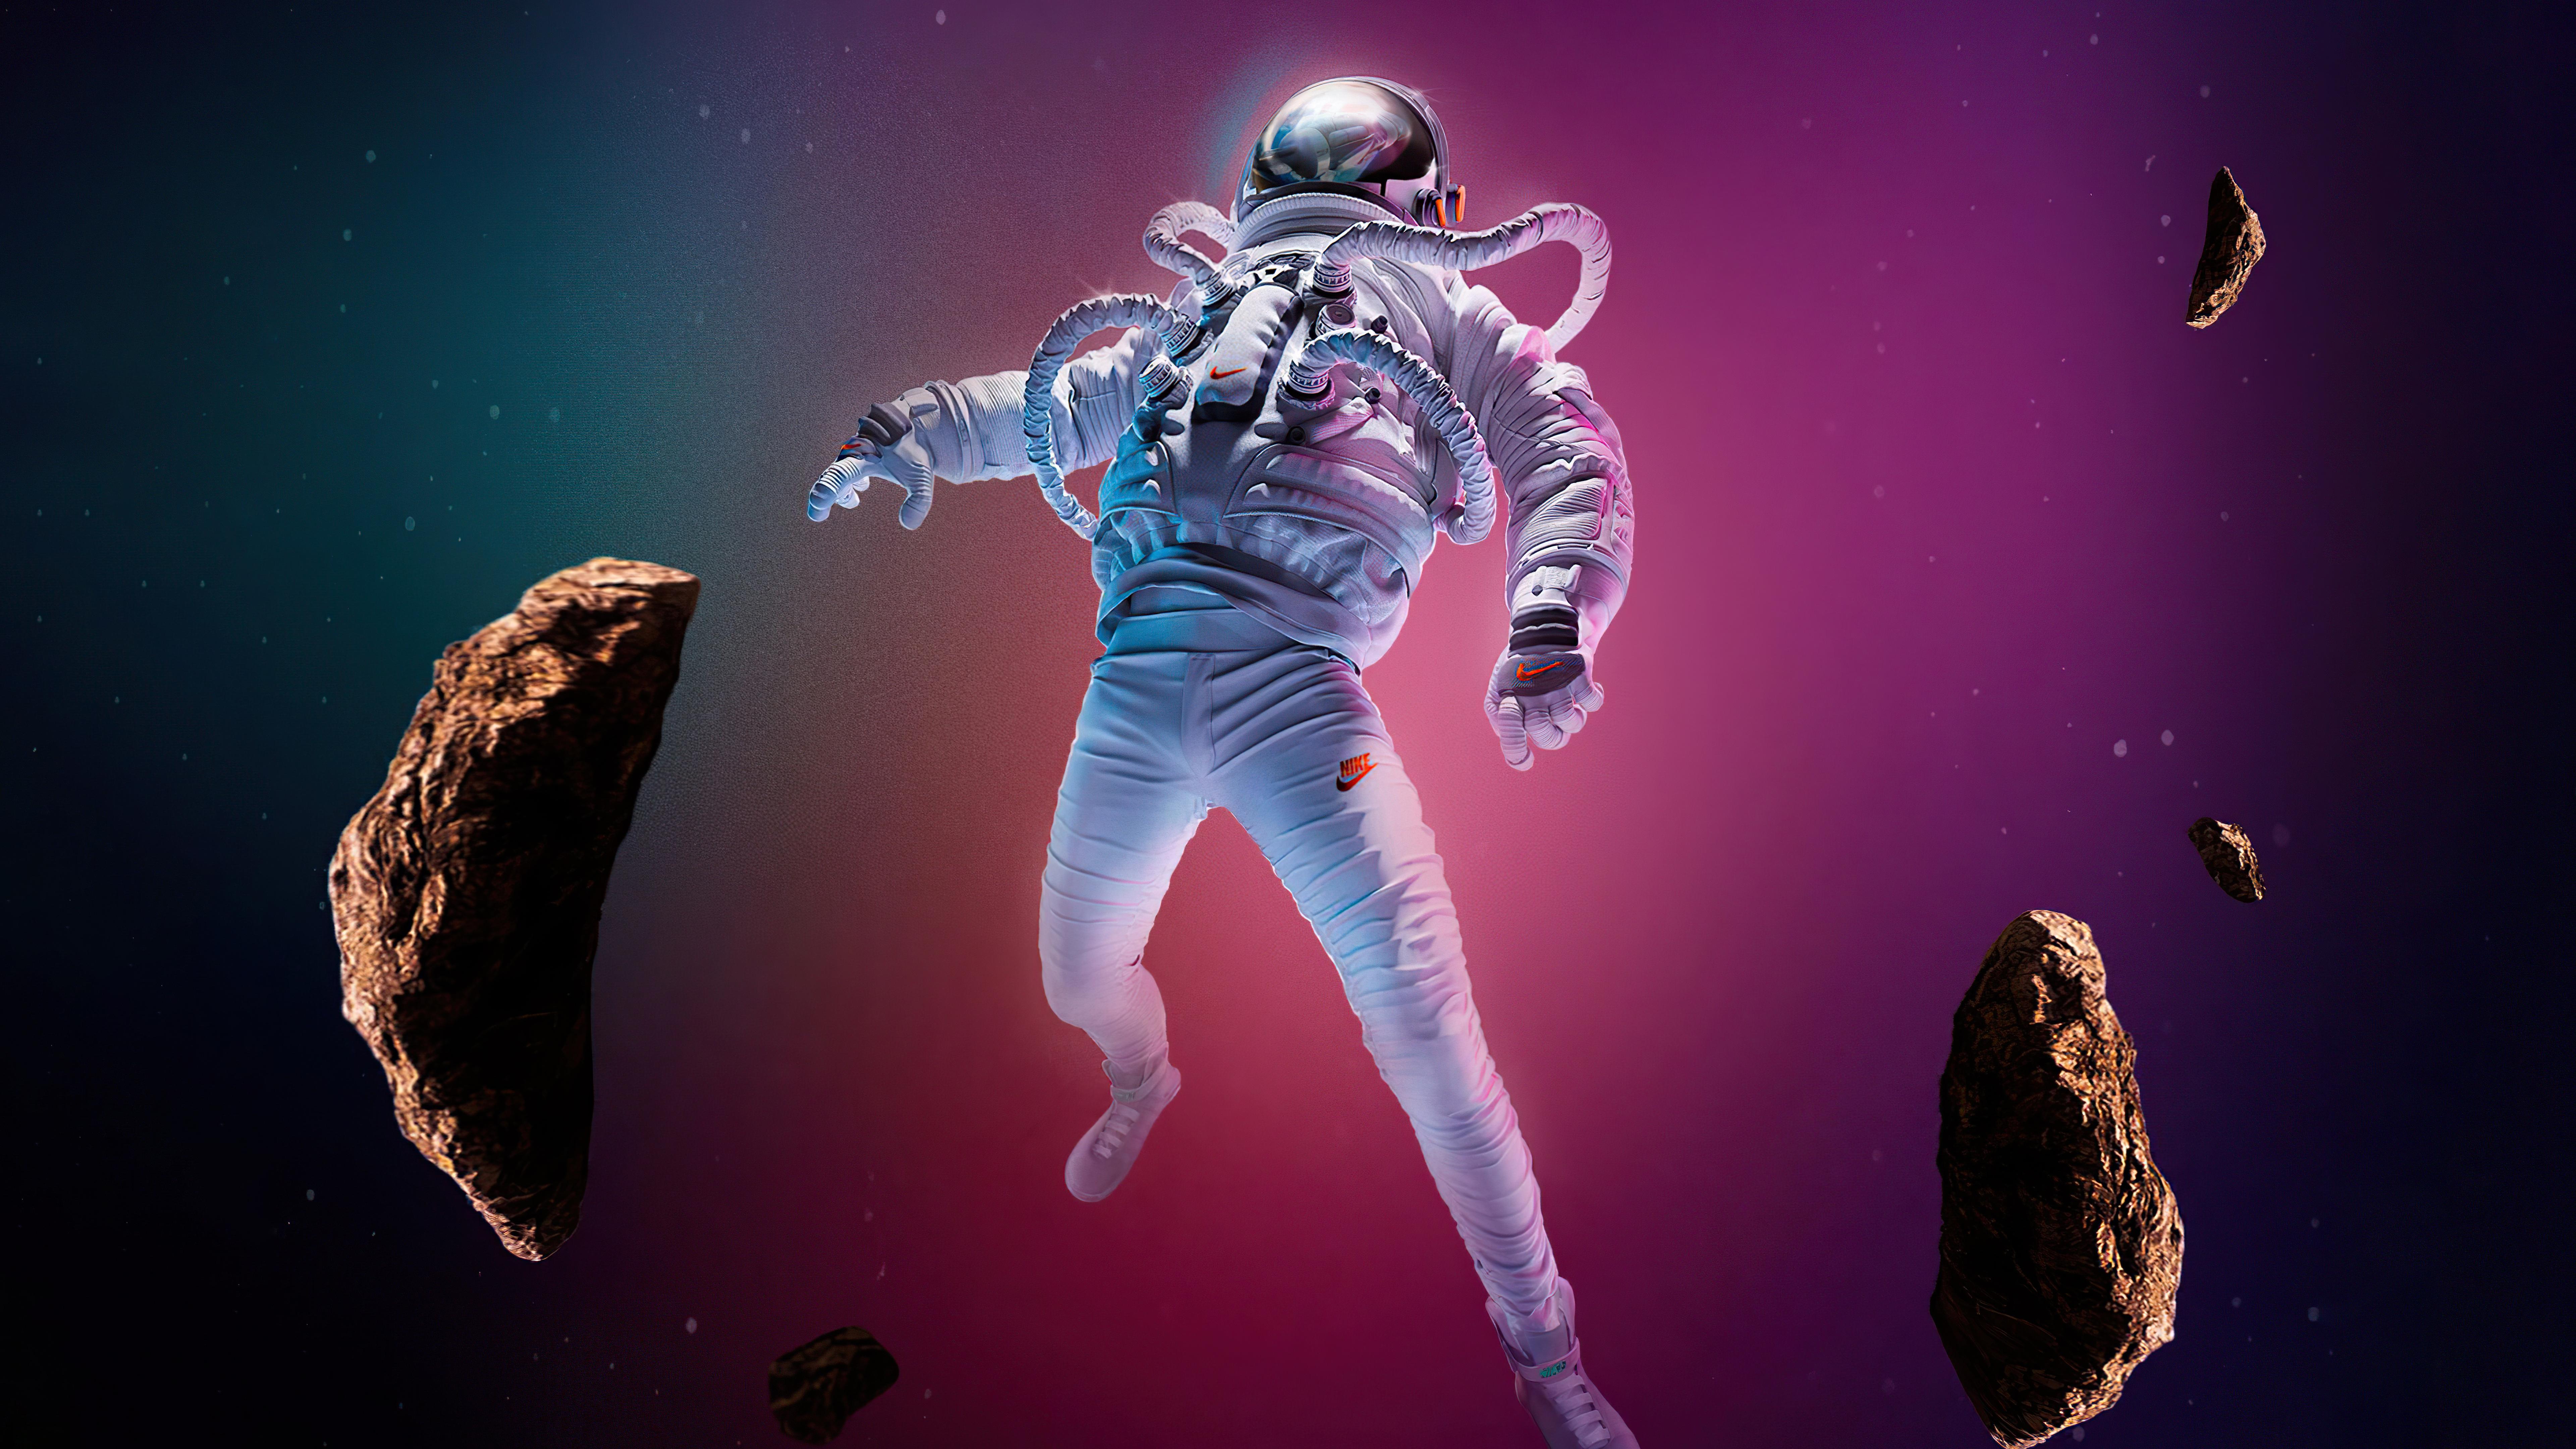 Wallpaper Astronaut falling